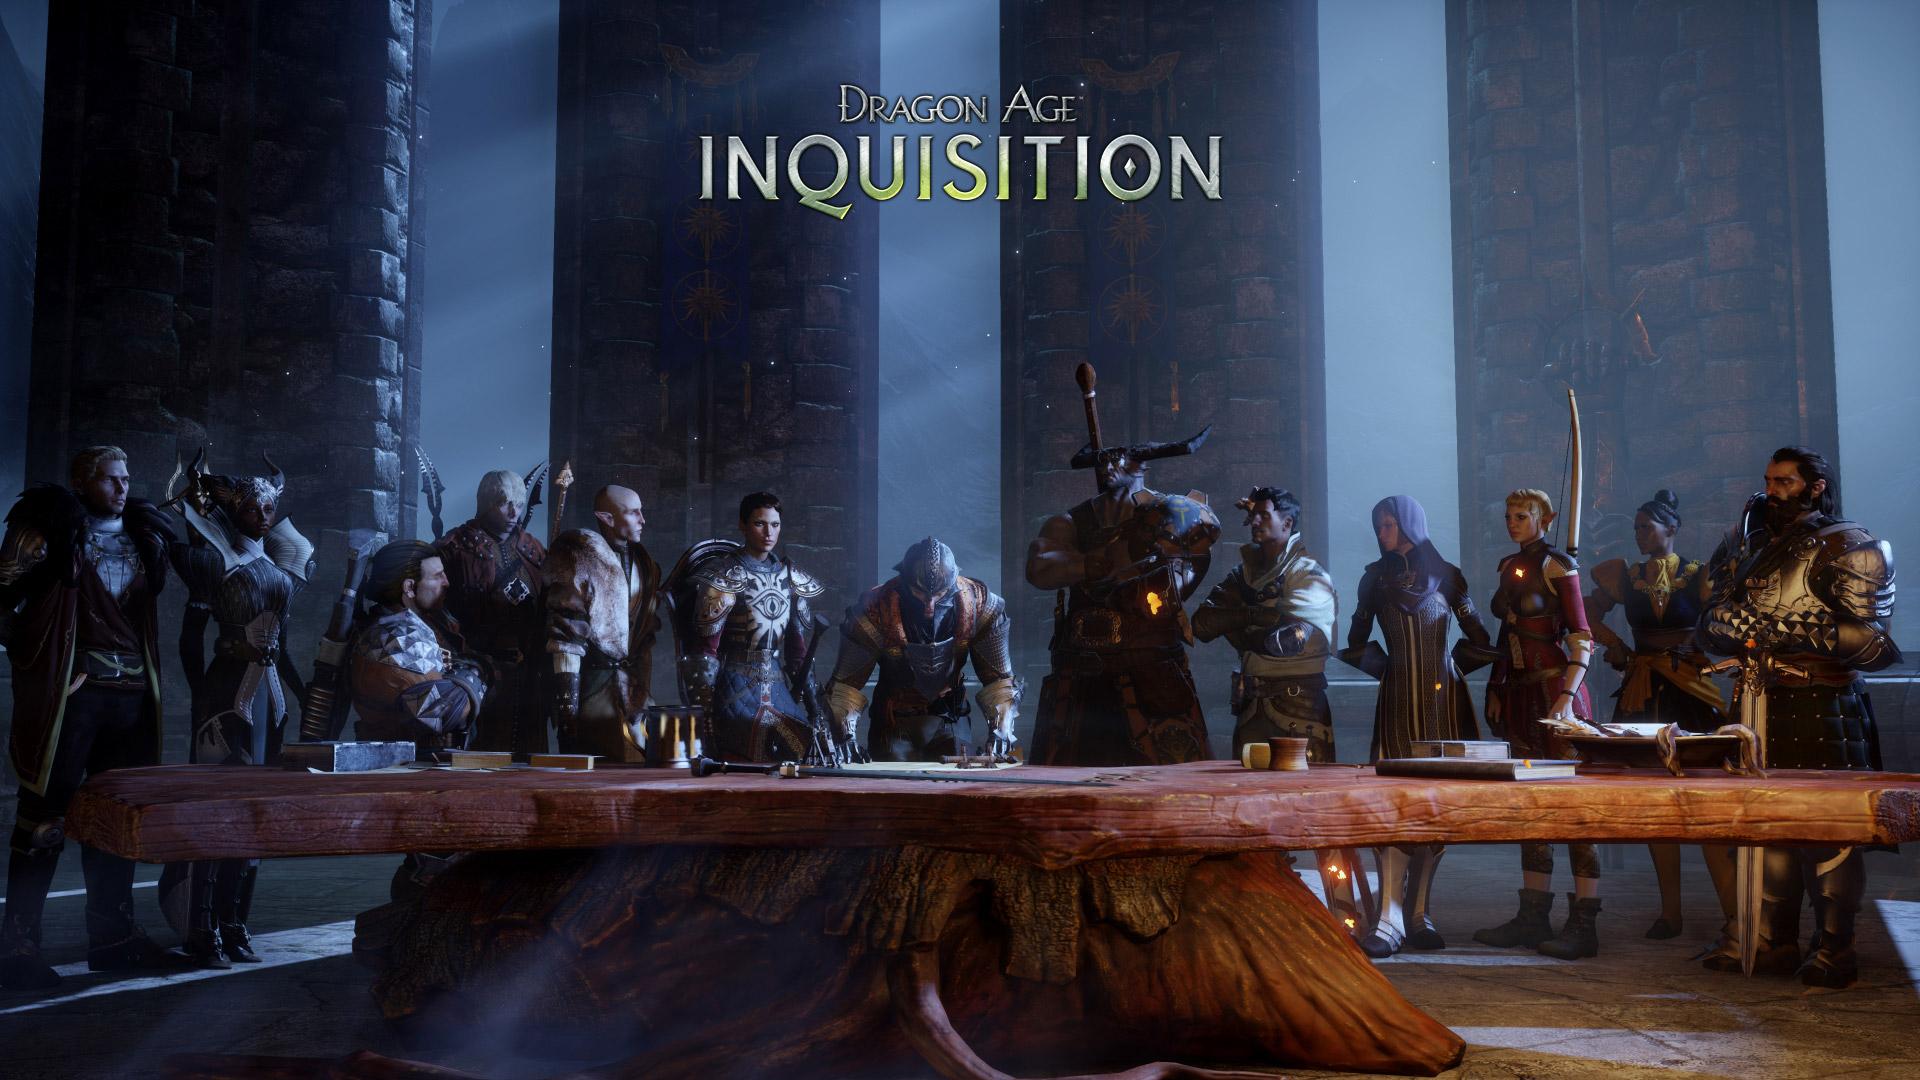 Dragon Age: Inquisition Wallpaper in 1920x1080